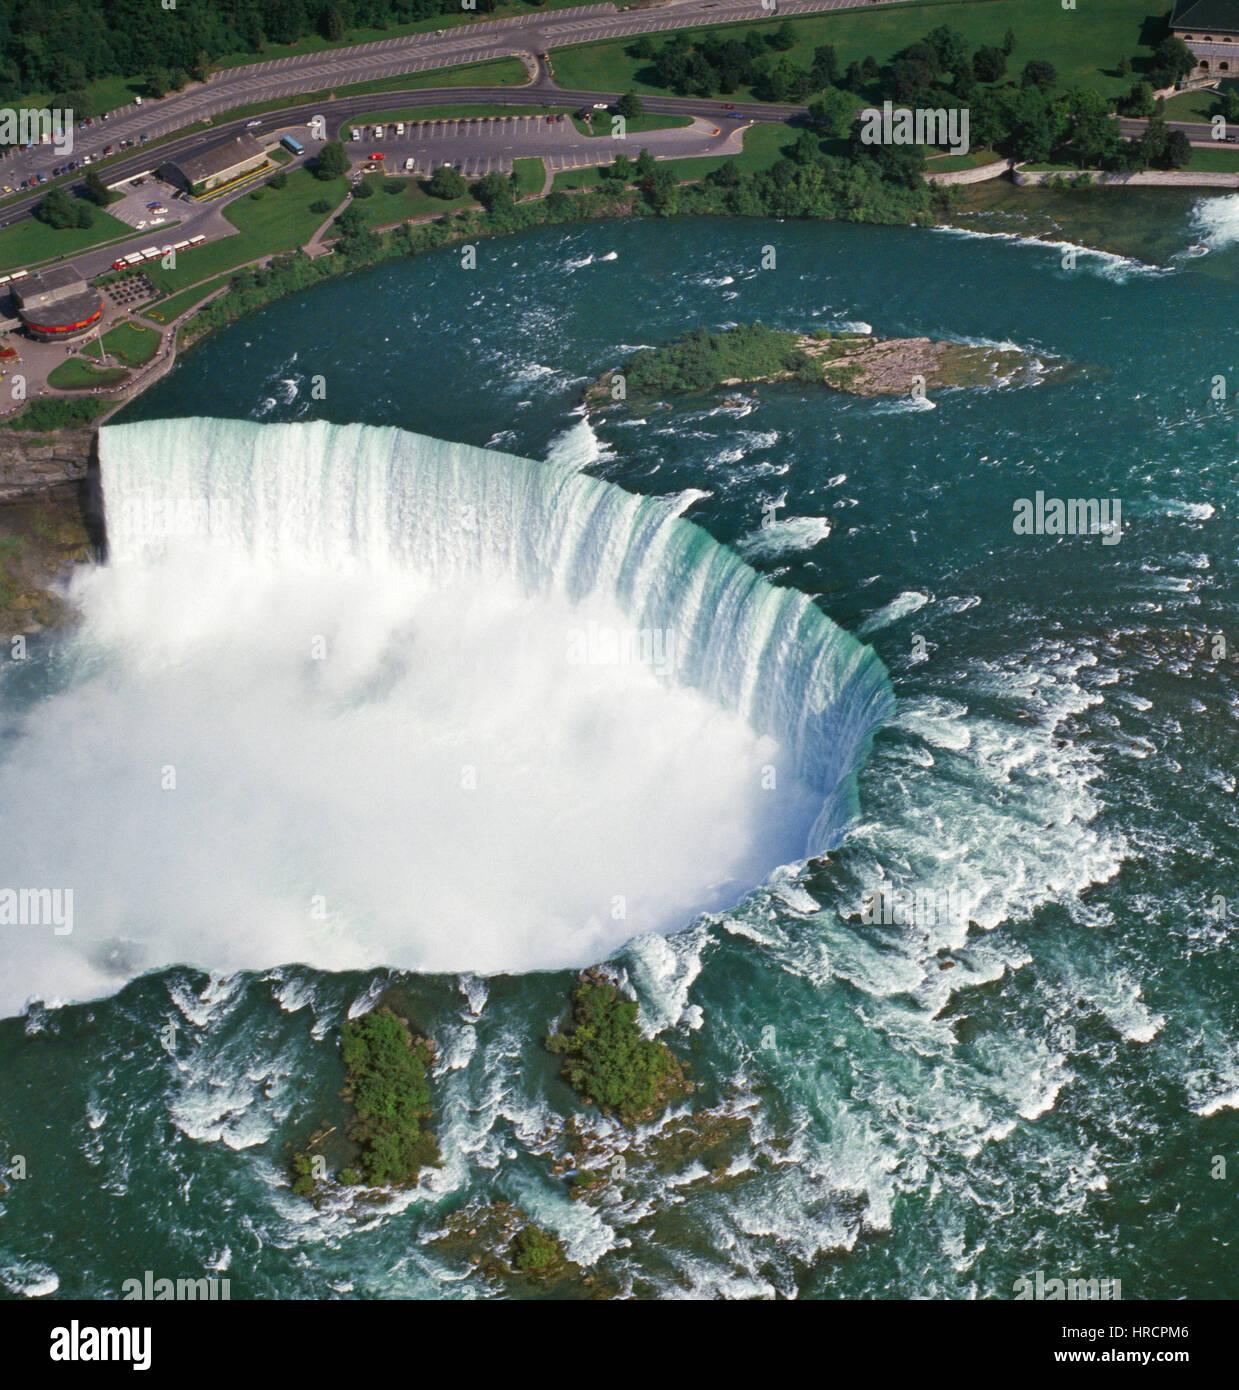 Luftaufnahme von Niagara Falls, Ontario, Kanada Stockbild